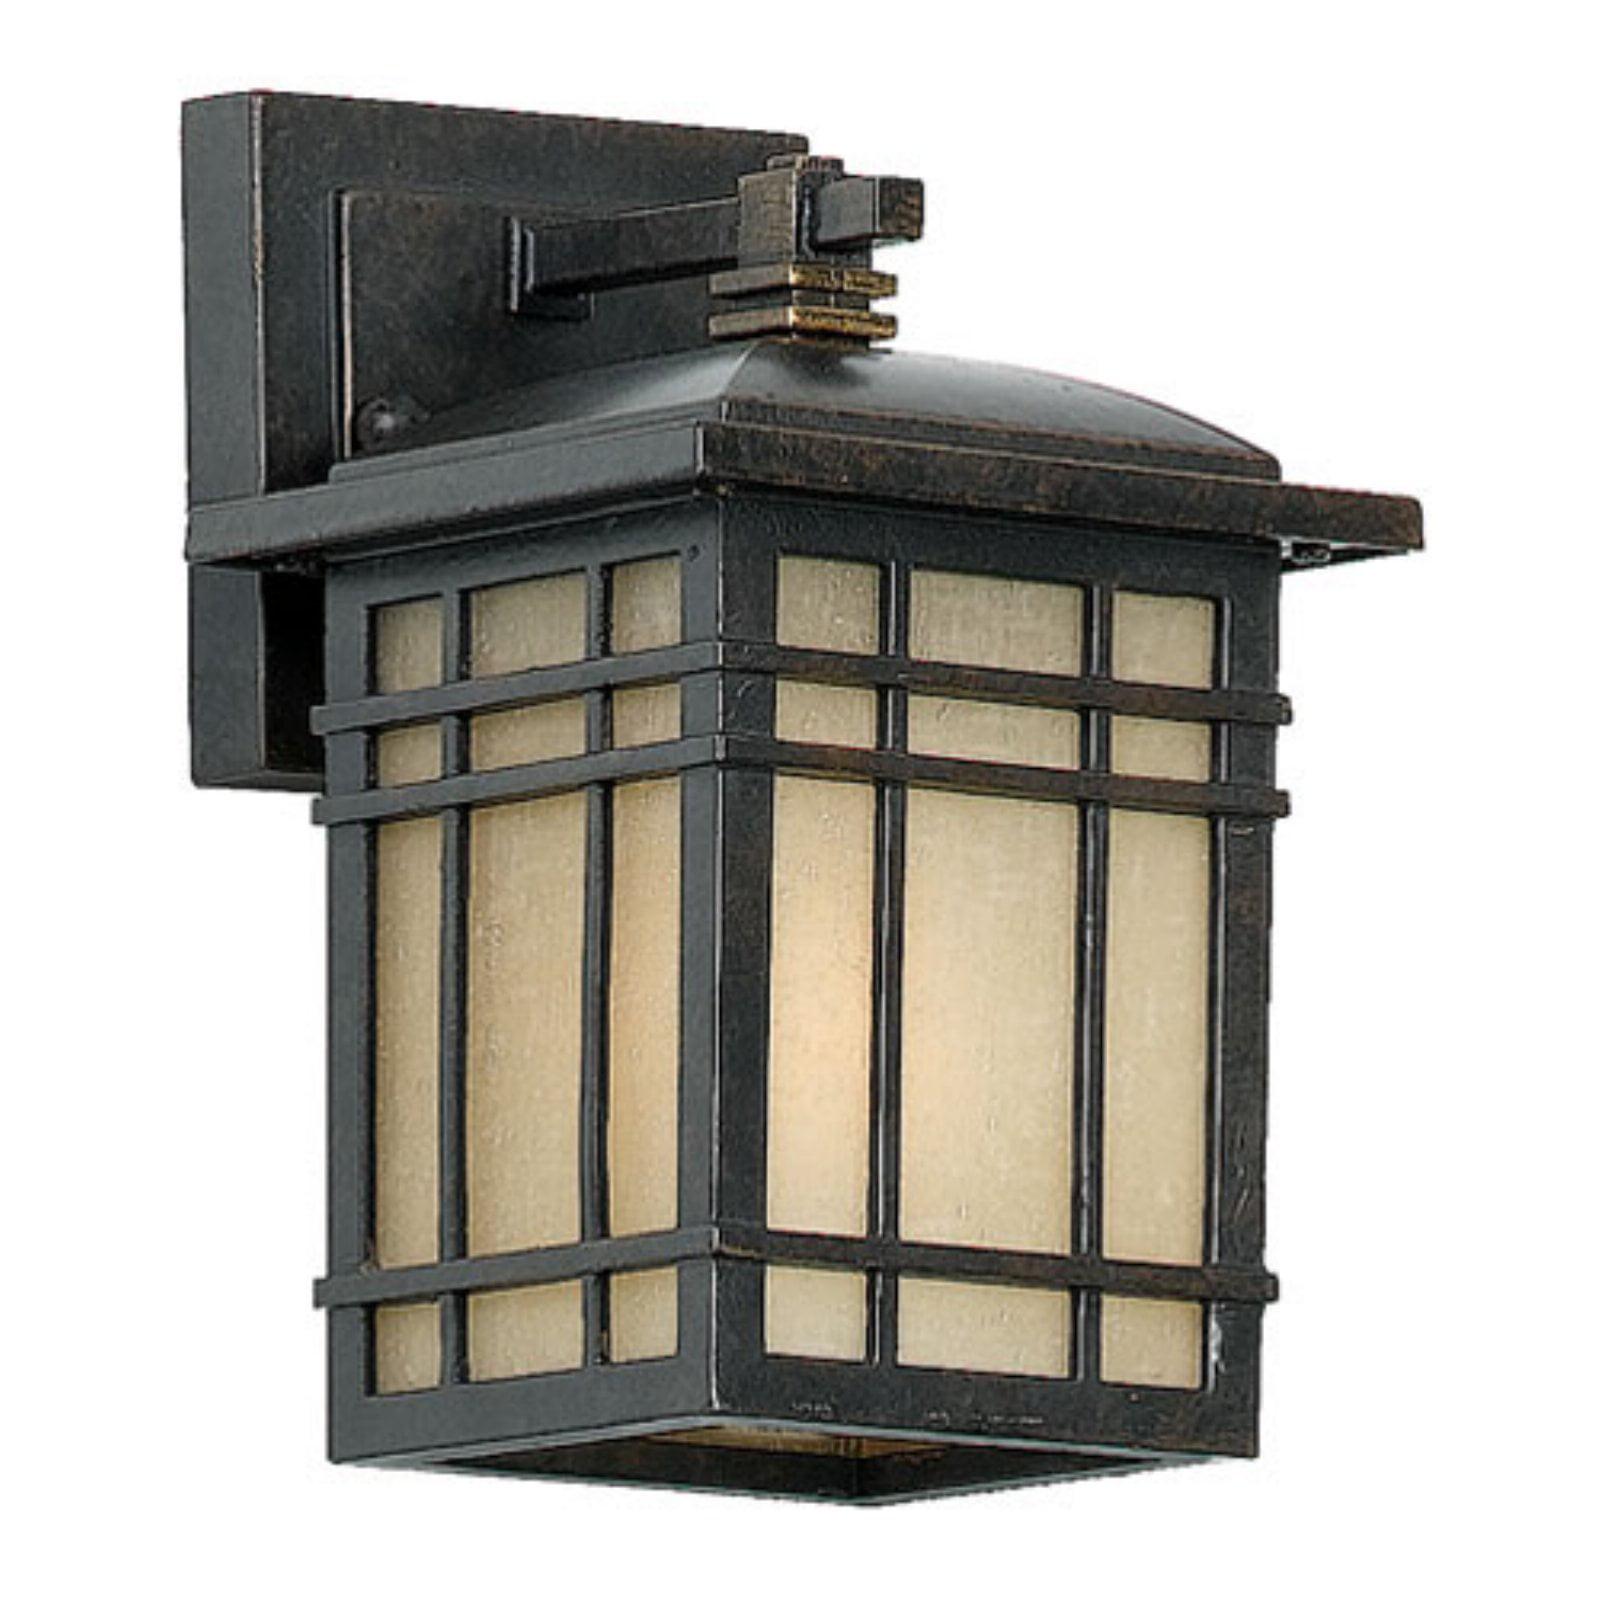 Quoizel Hillcrest HC8406IB Outdoor Wall Lantern